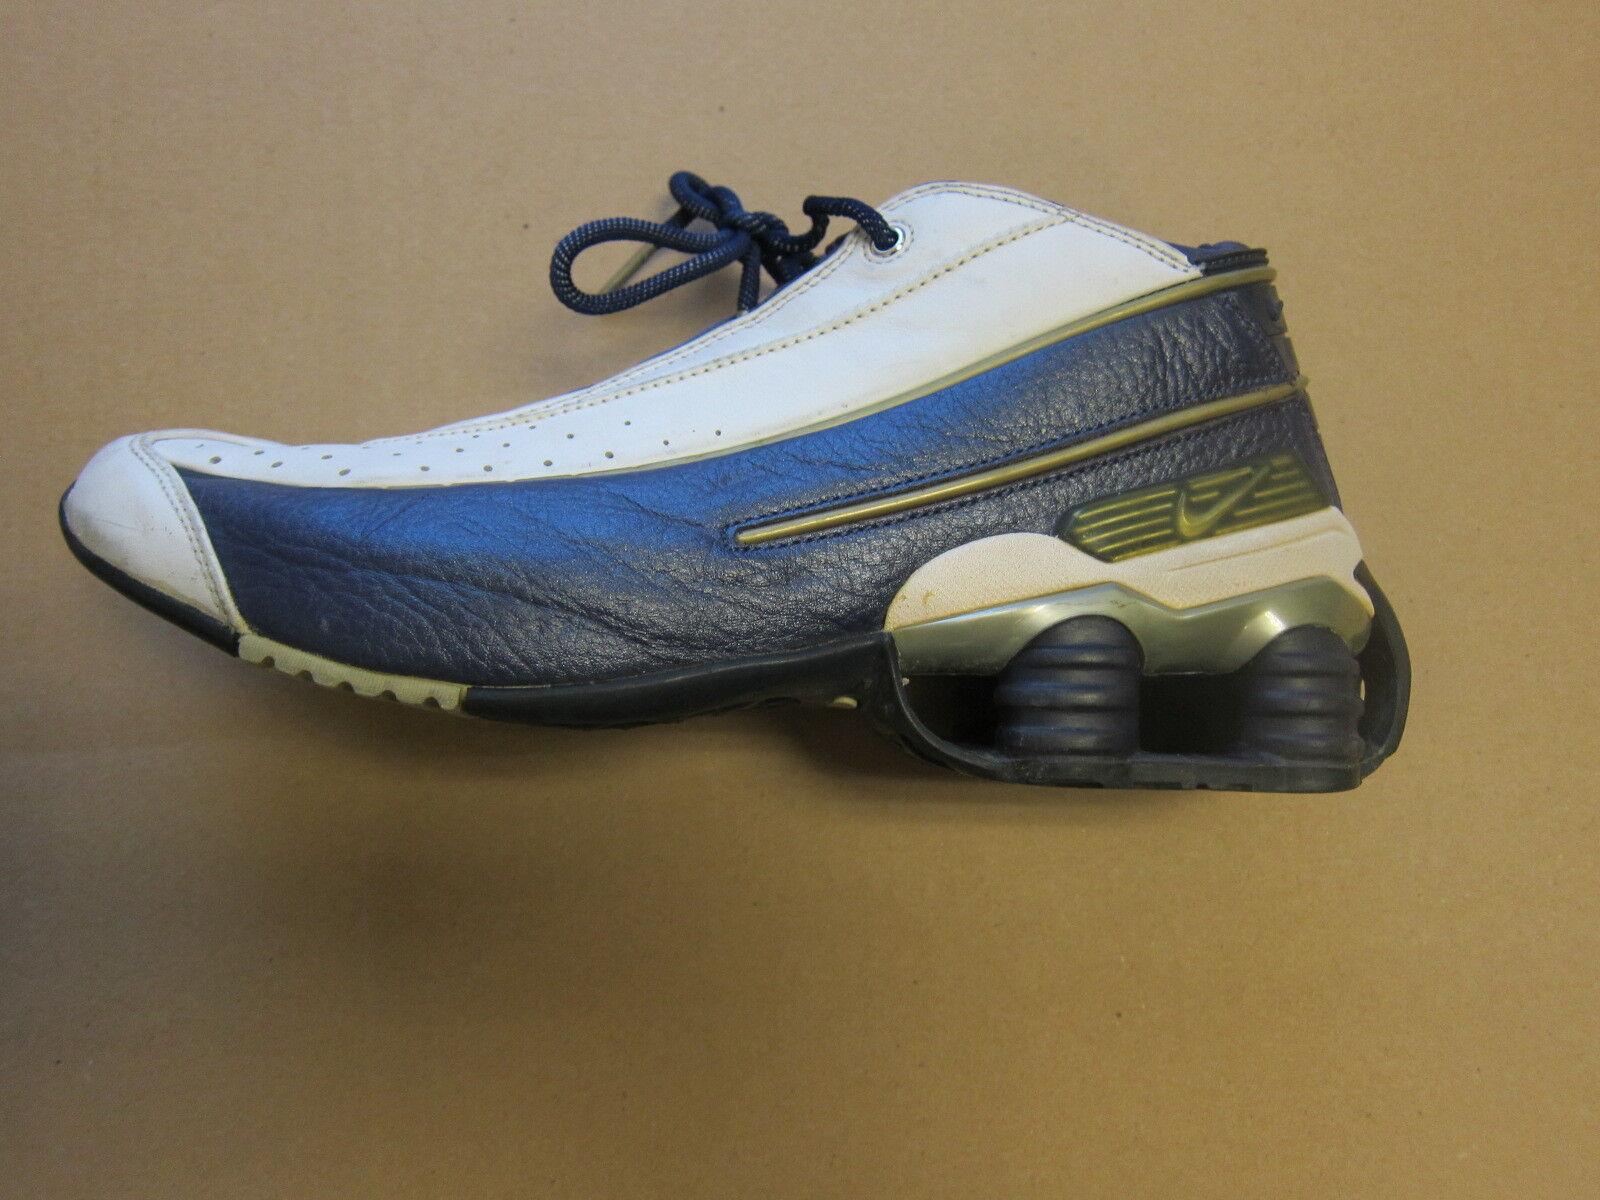 nike shox ken griffey jr nestlö 2002 ausbildung sneaker männer marine blau - weißer männer sneaker größe 10,5 7163ce